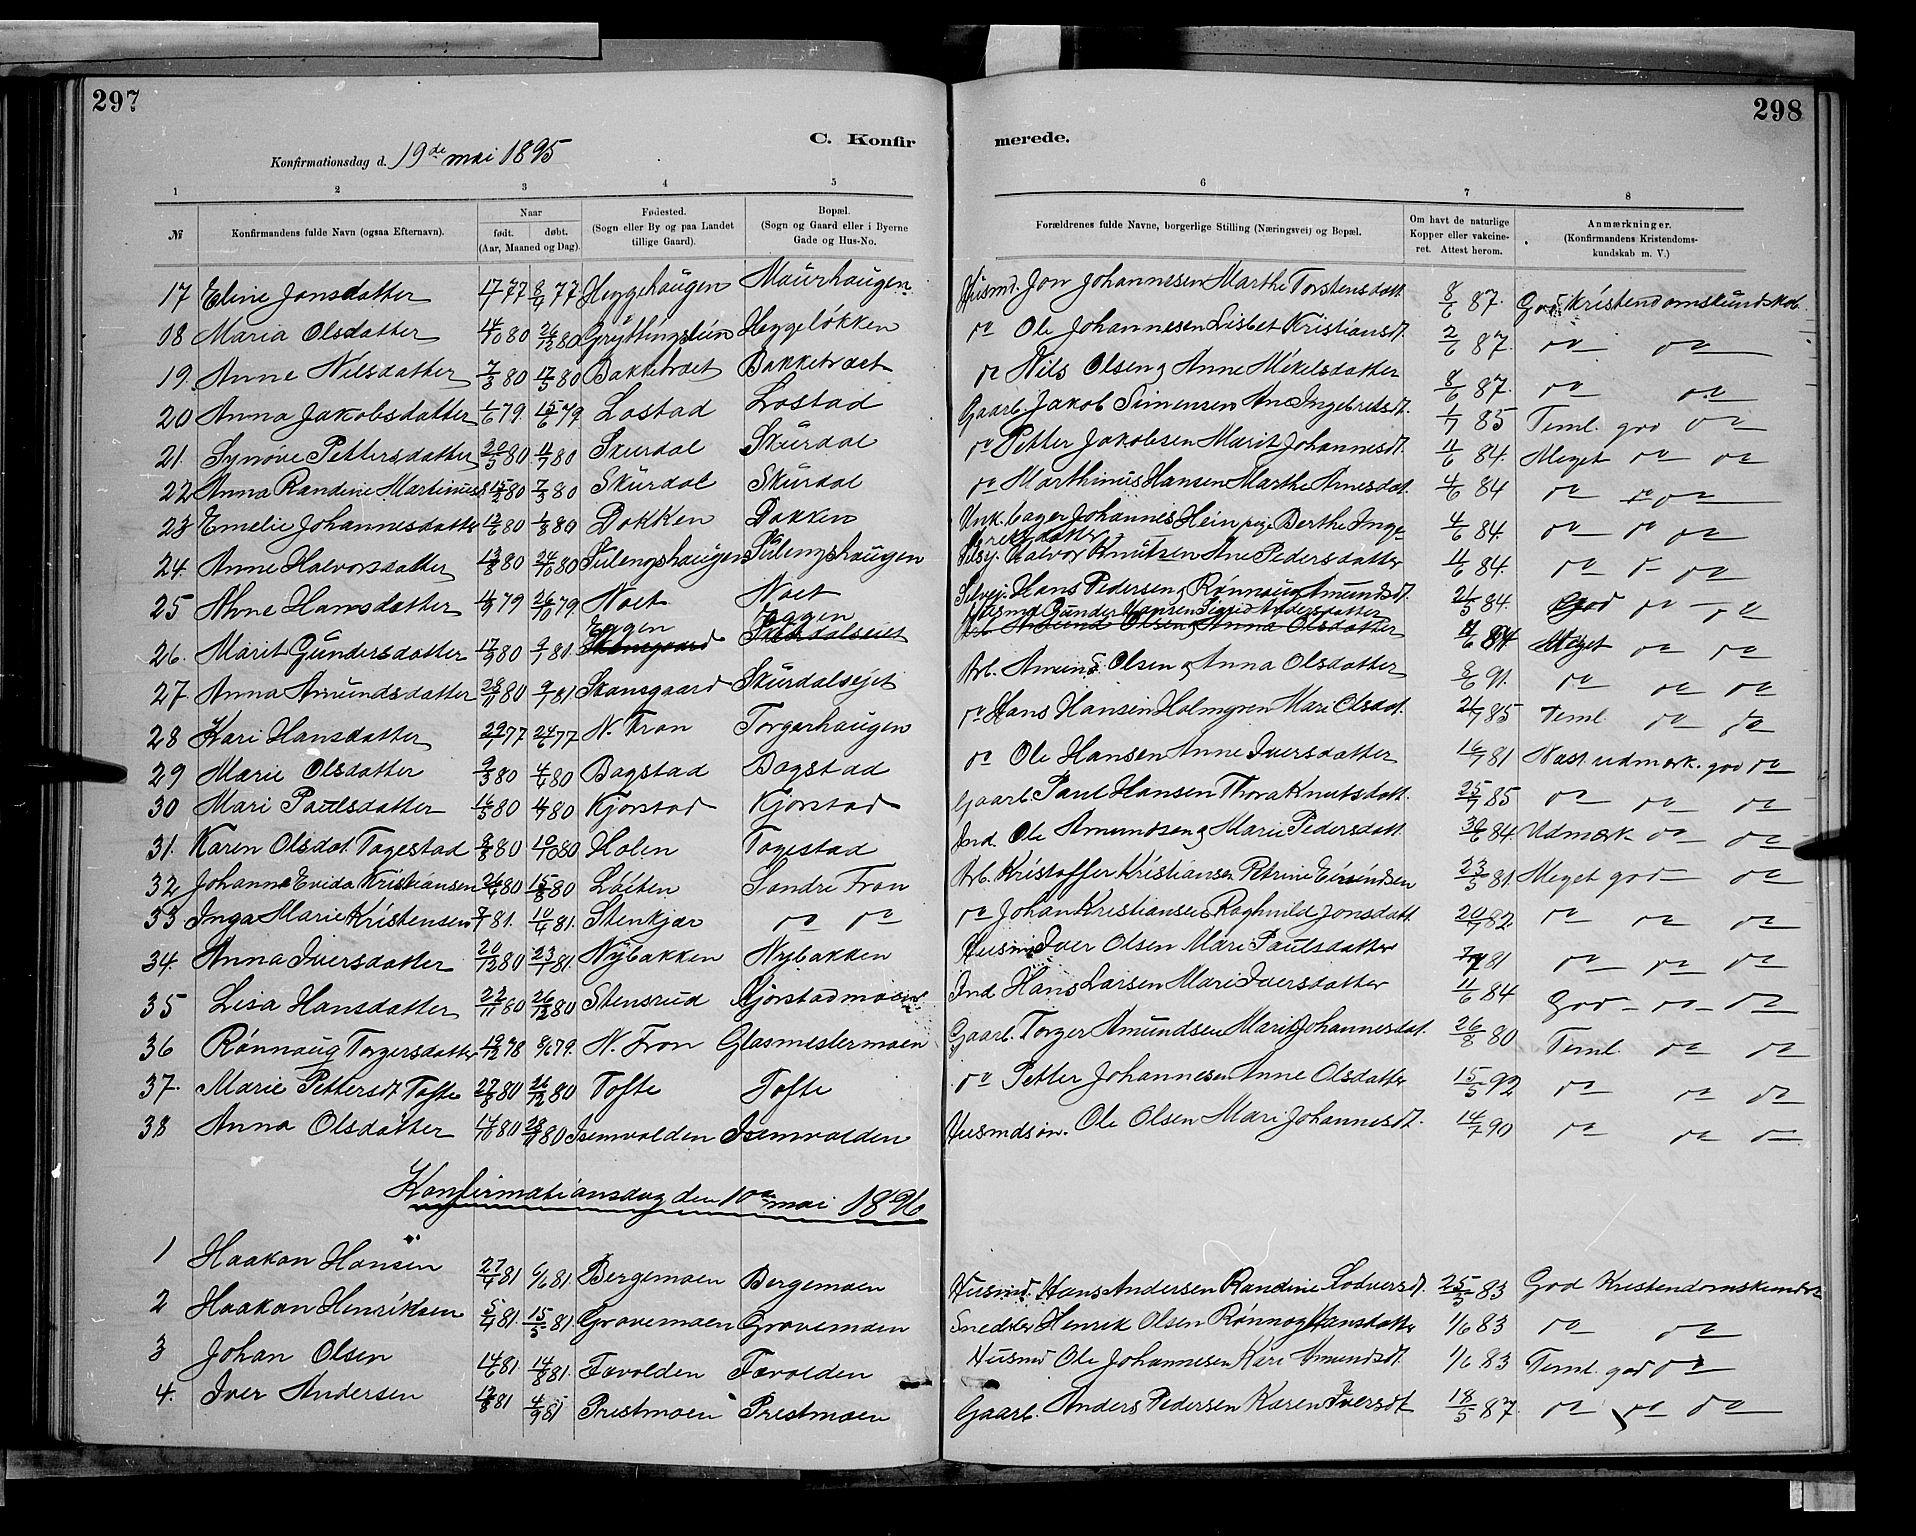 SAH, Sør-Fron prestekontor, H/Ha/Hab/L0003: Klokkerbok nr. 3, 1884-1896, s. 297-298